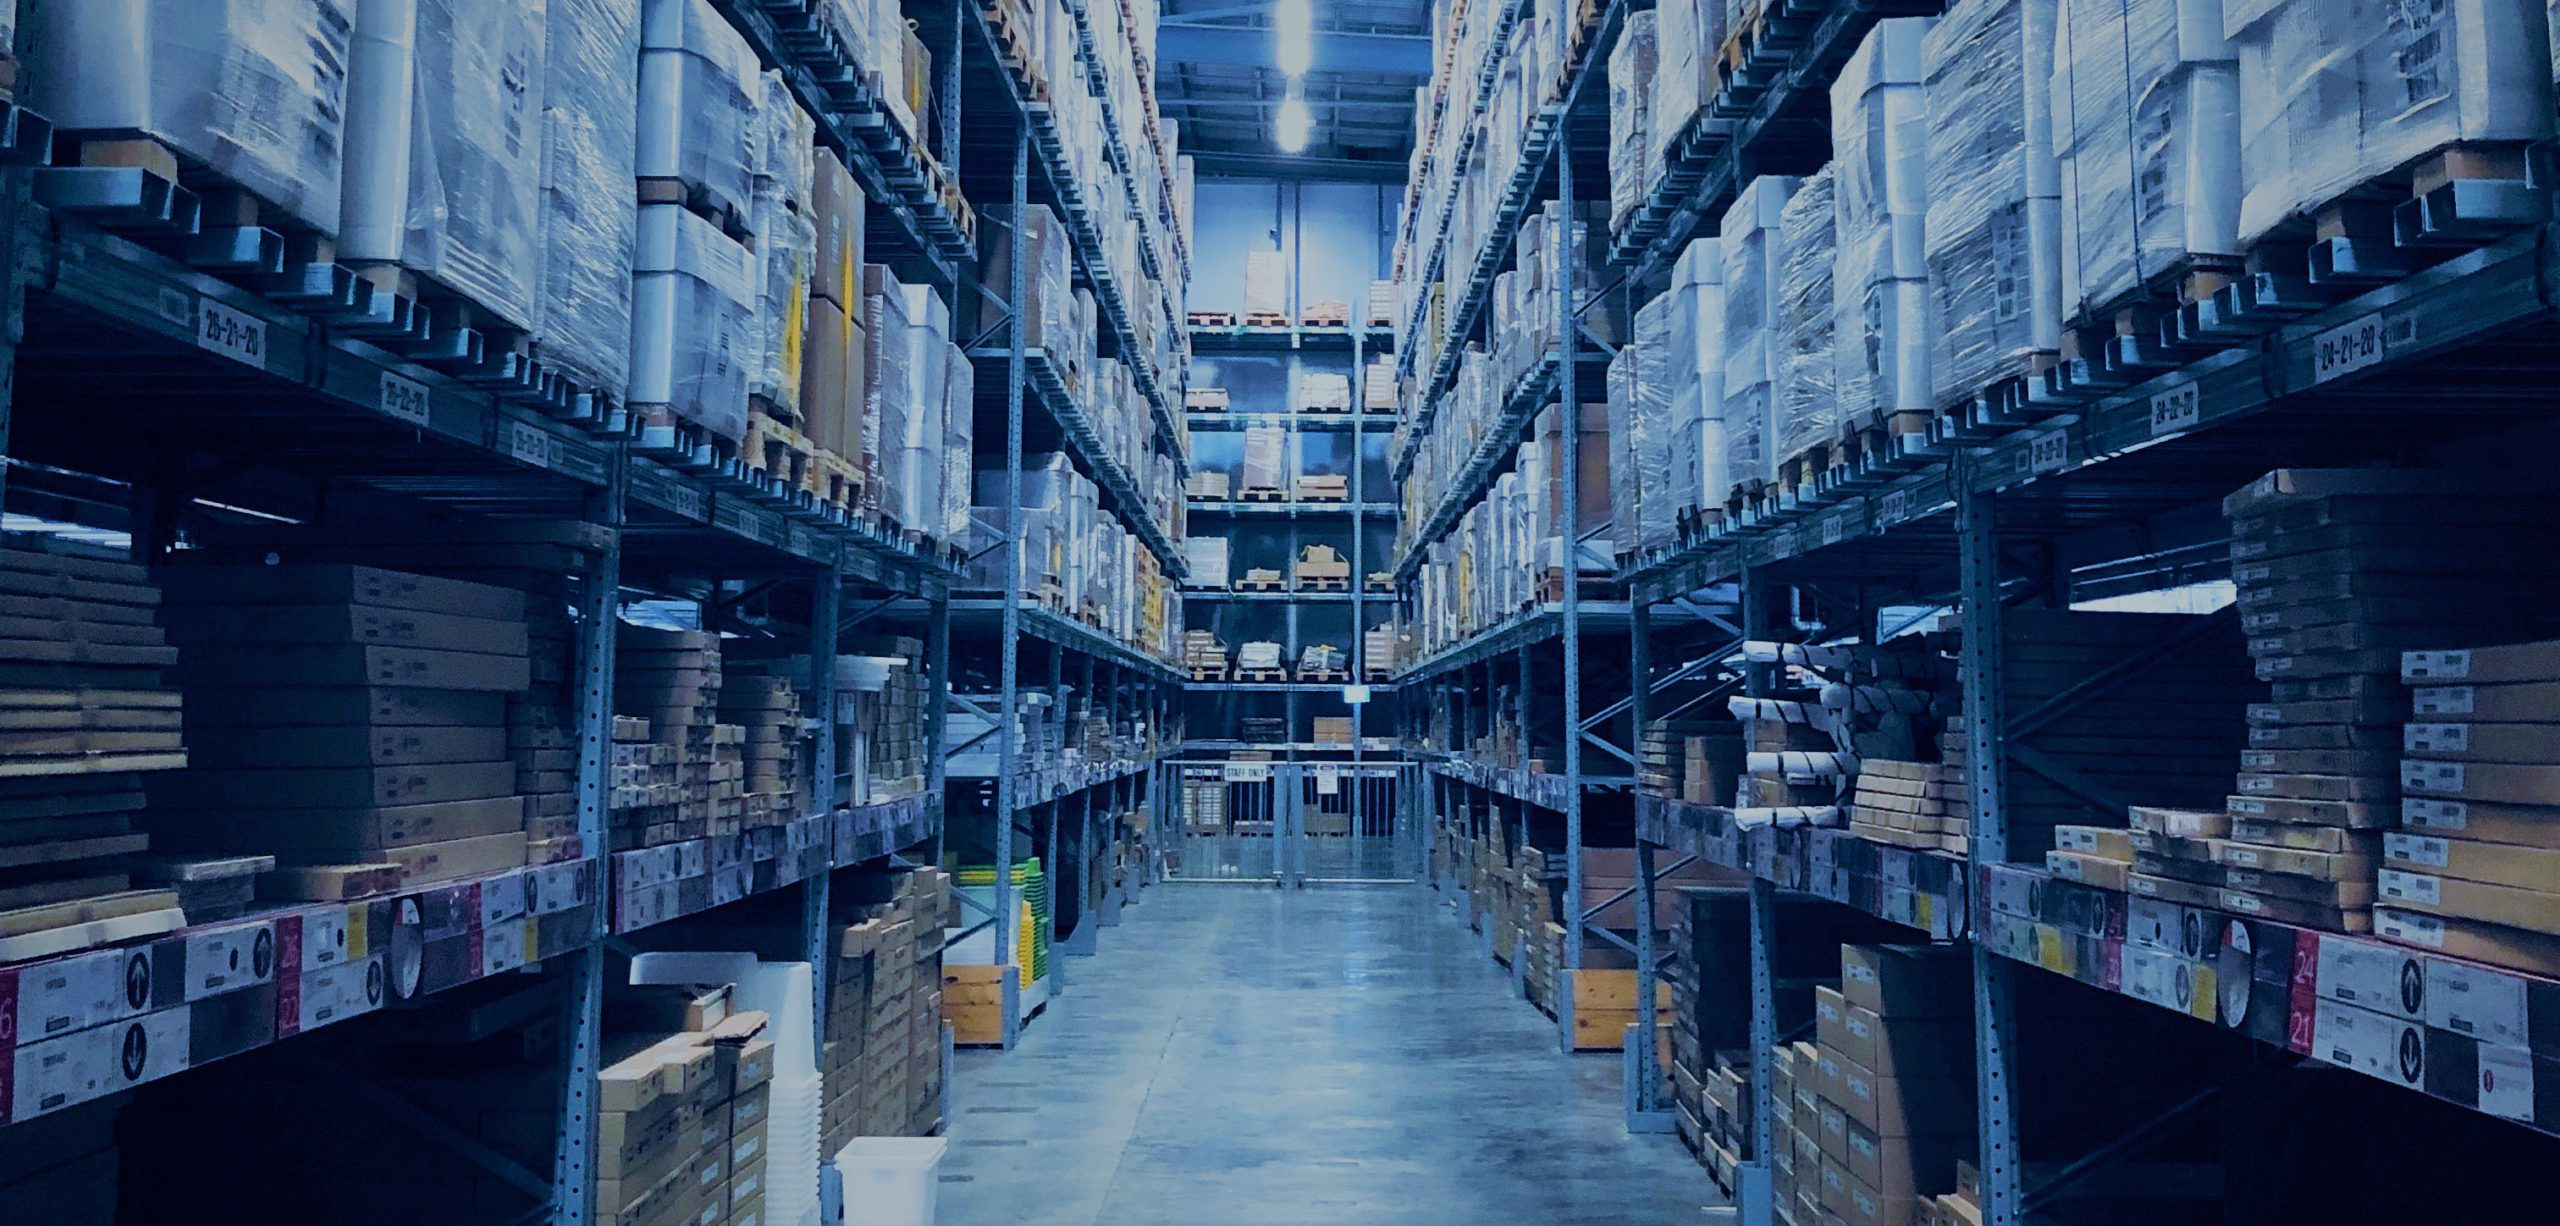 Warehousing Advantages at a 3PL Transport Provider: White Glove Service